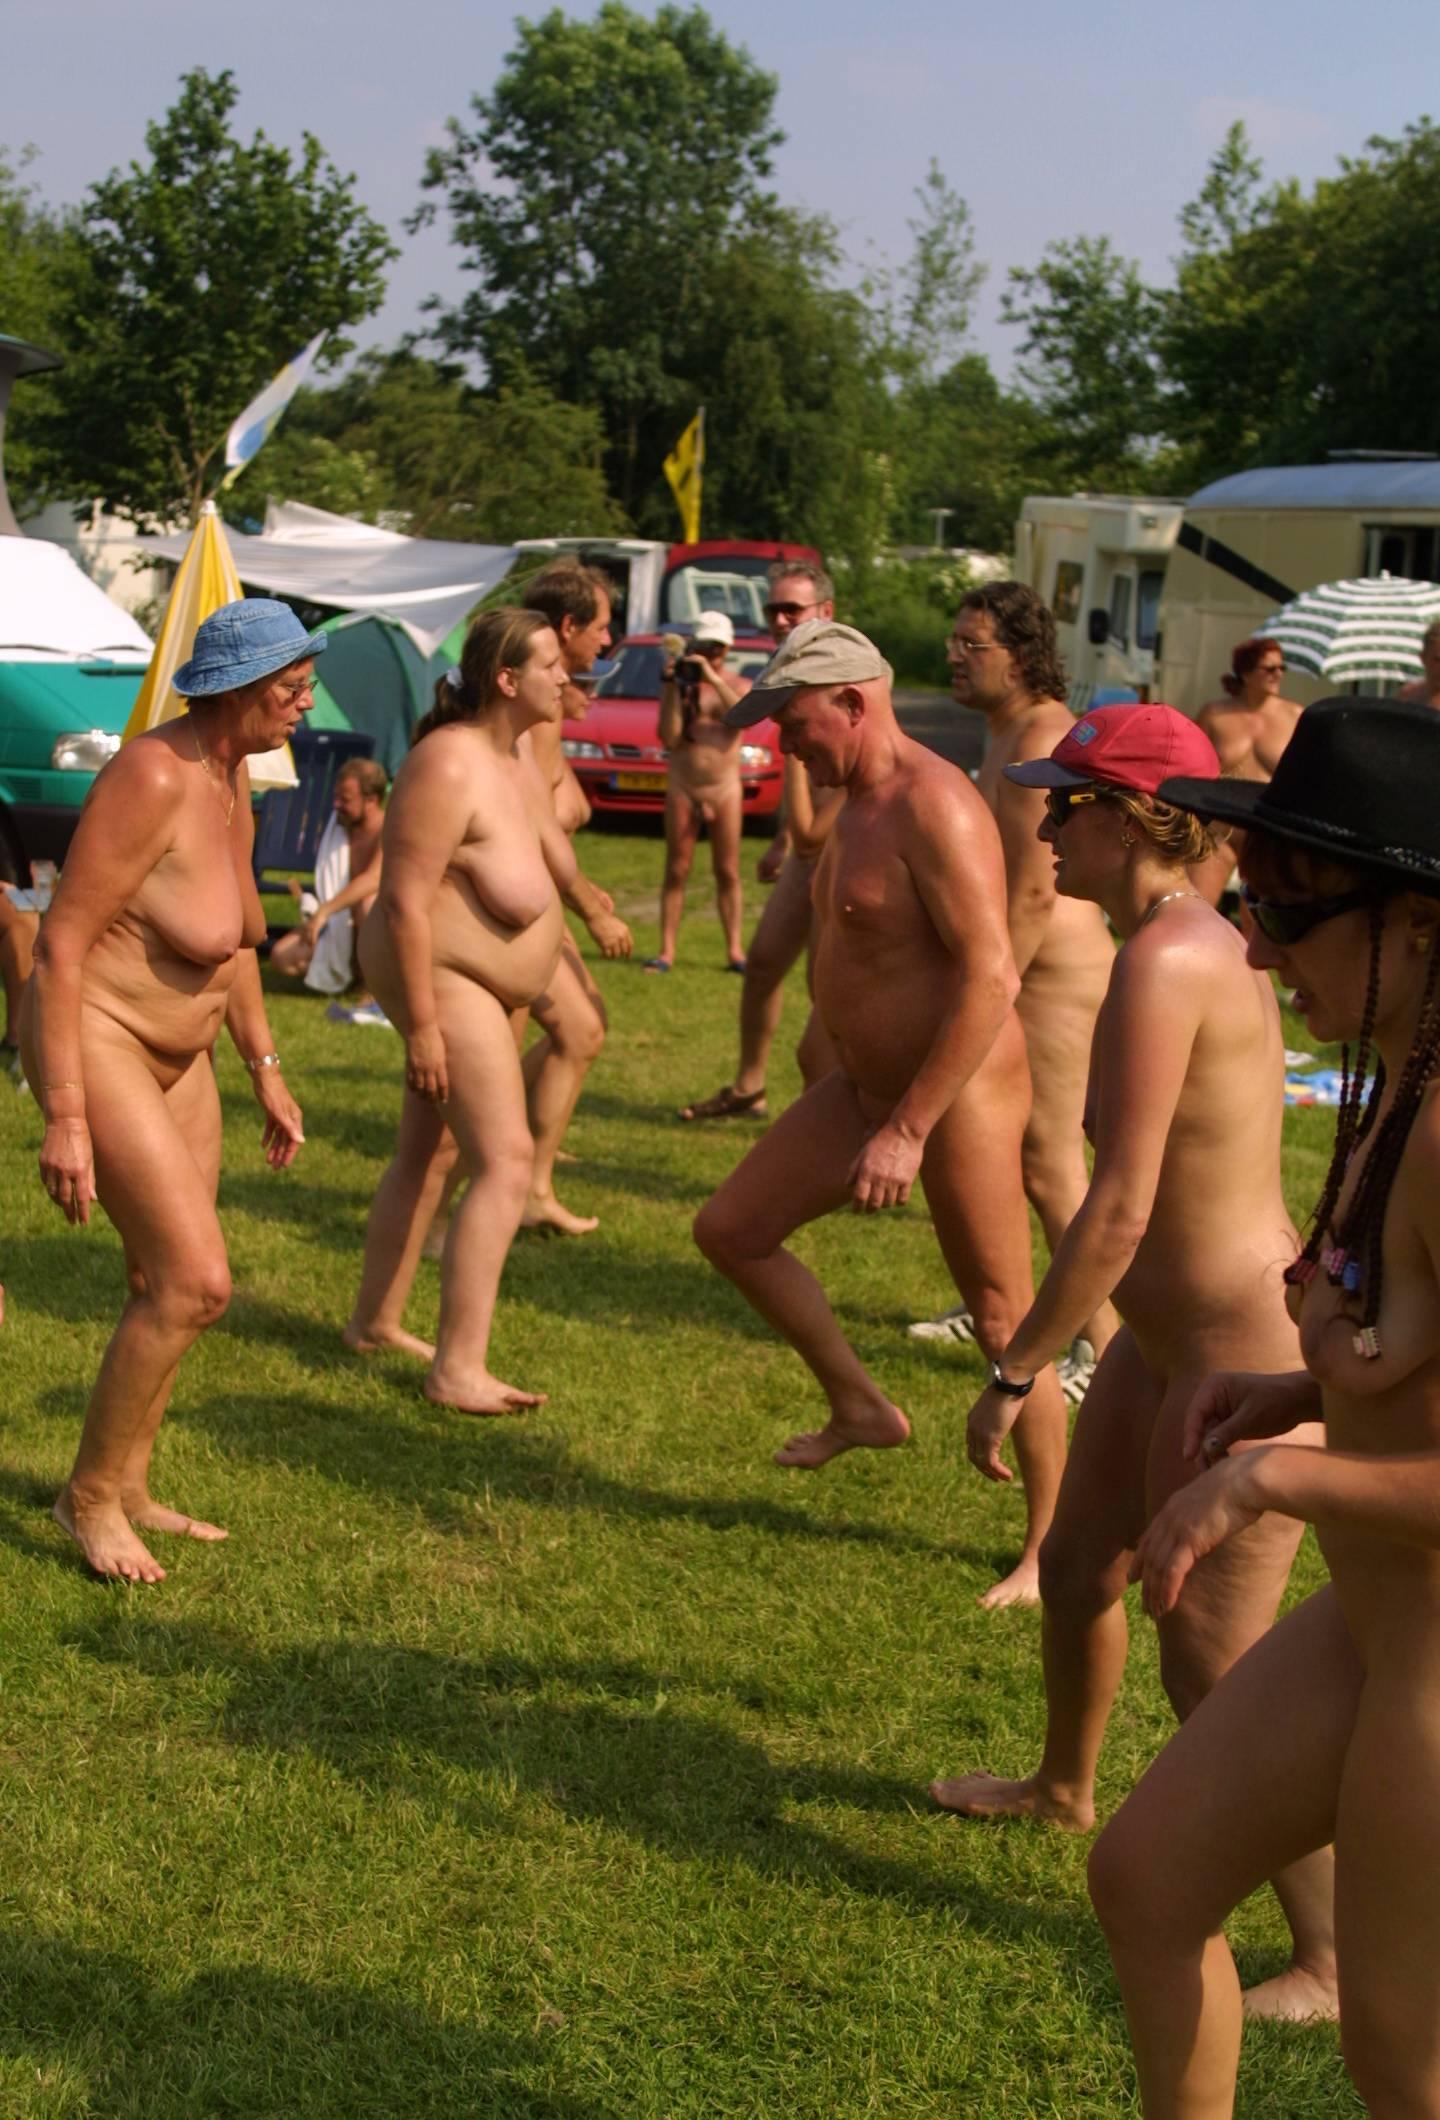 Nudist Photos Holland Nude Group Photo - 1